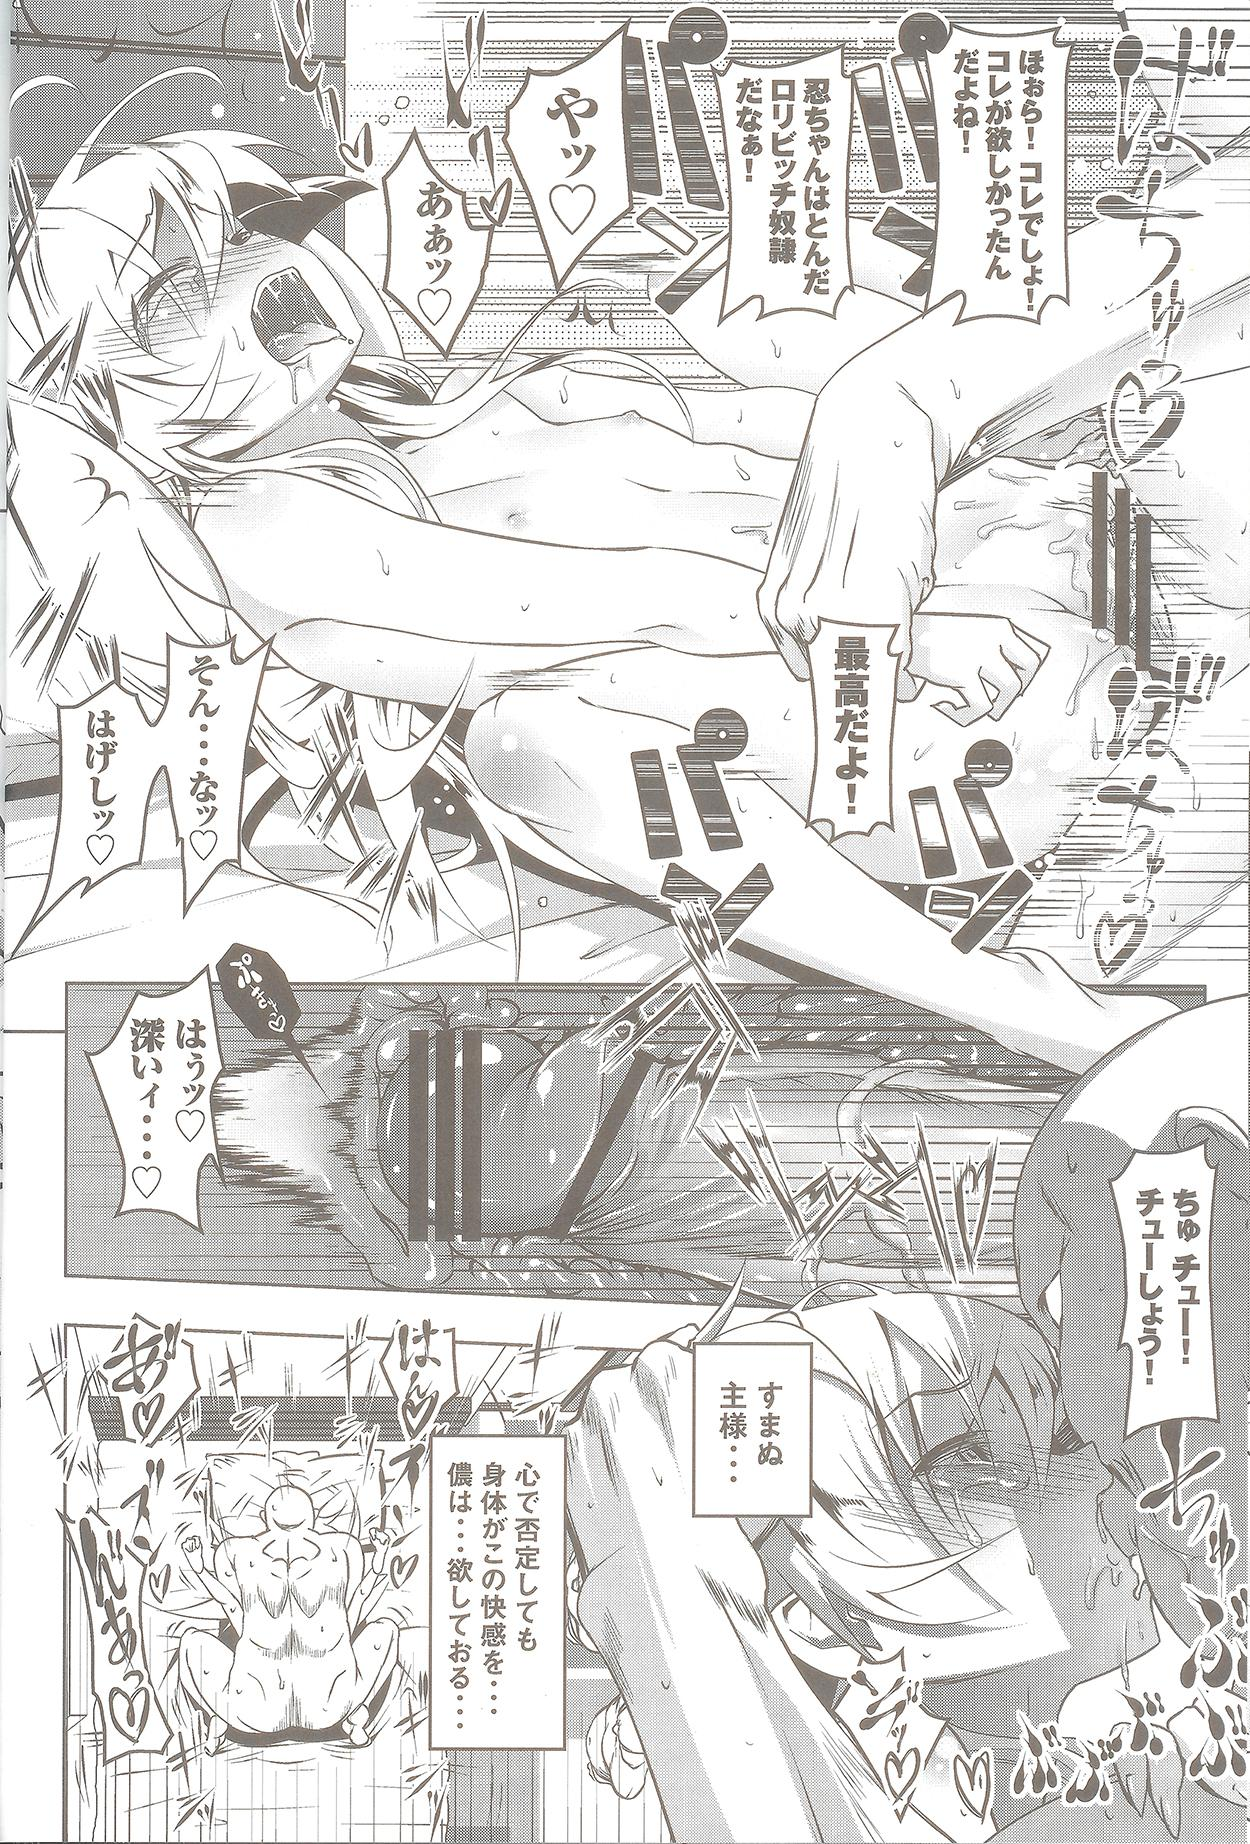 Netoraregatari San 23